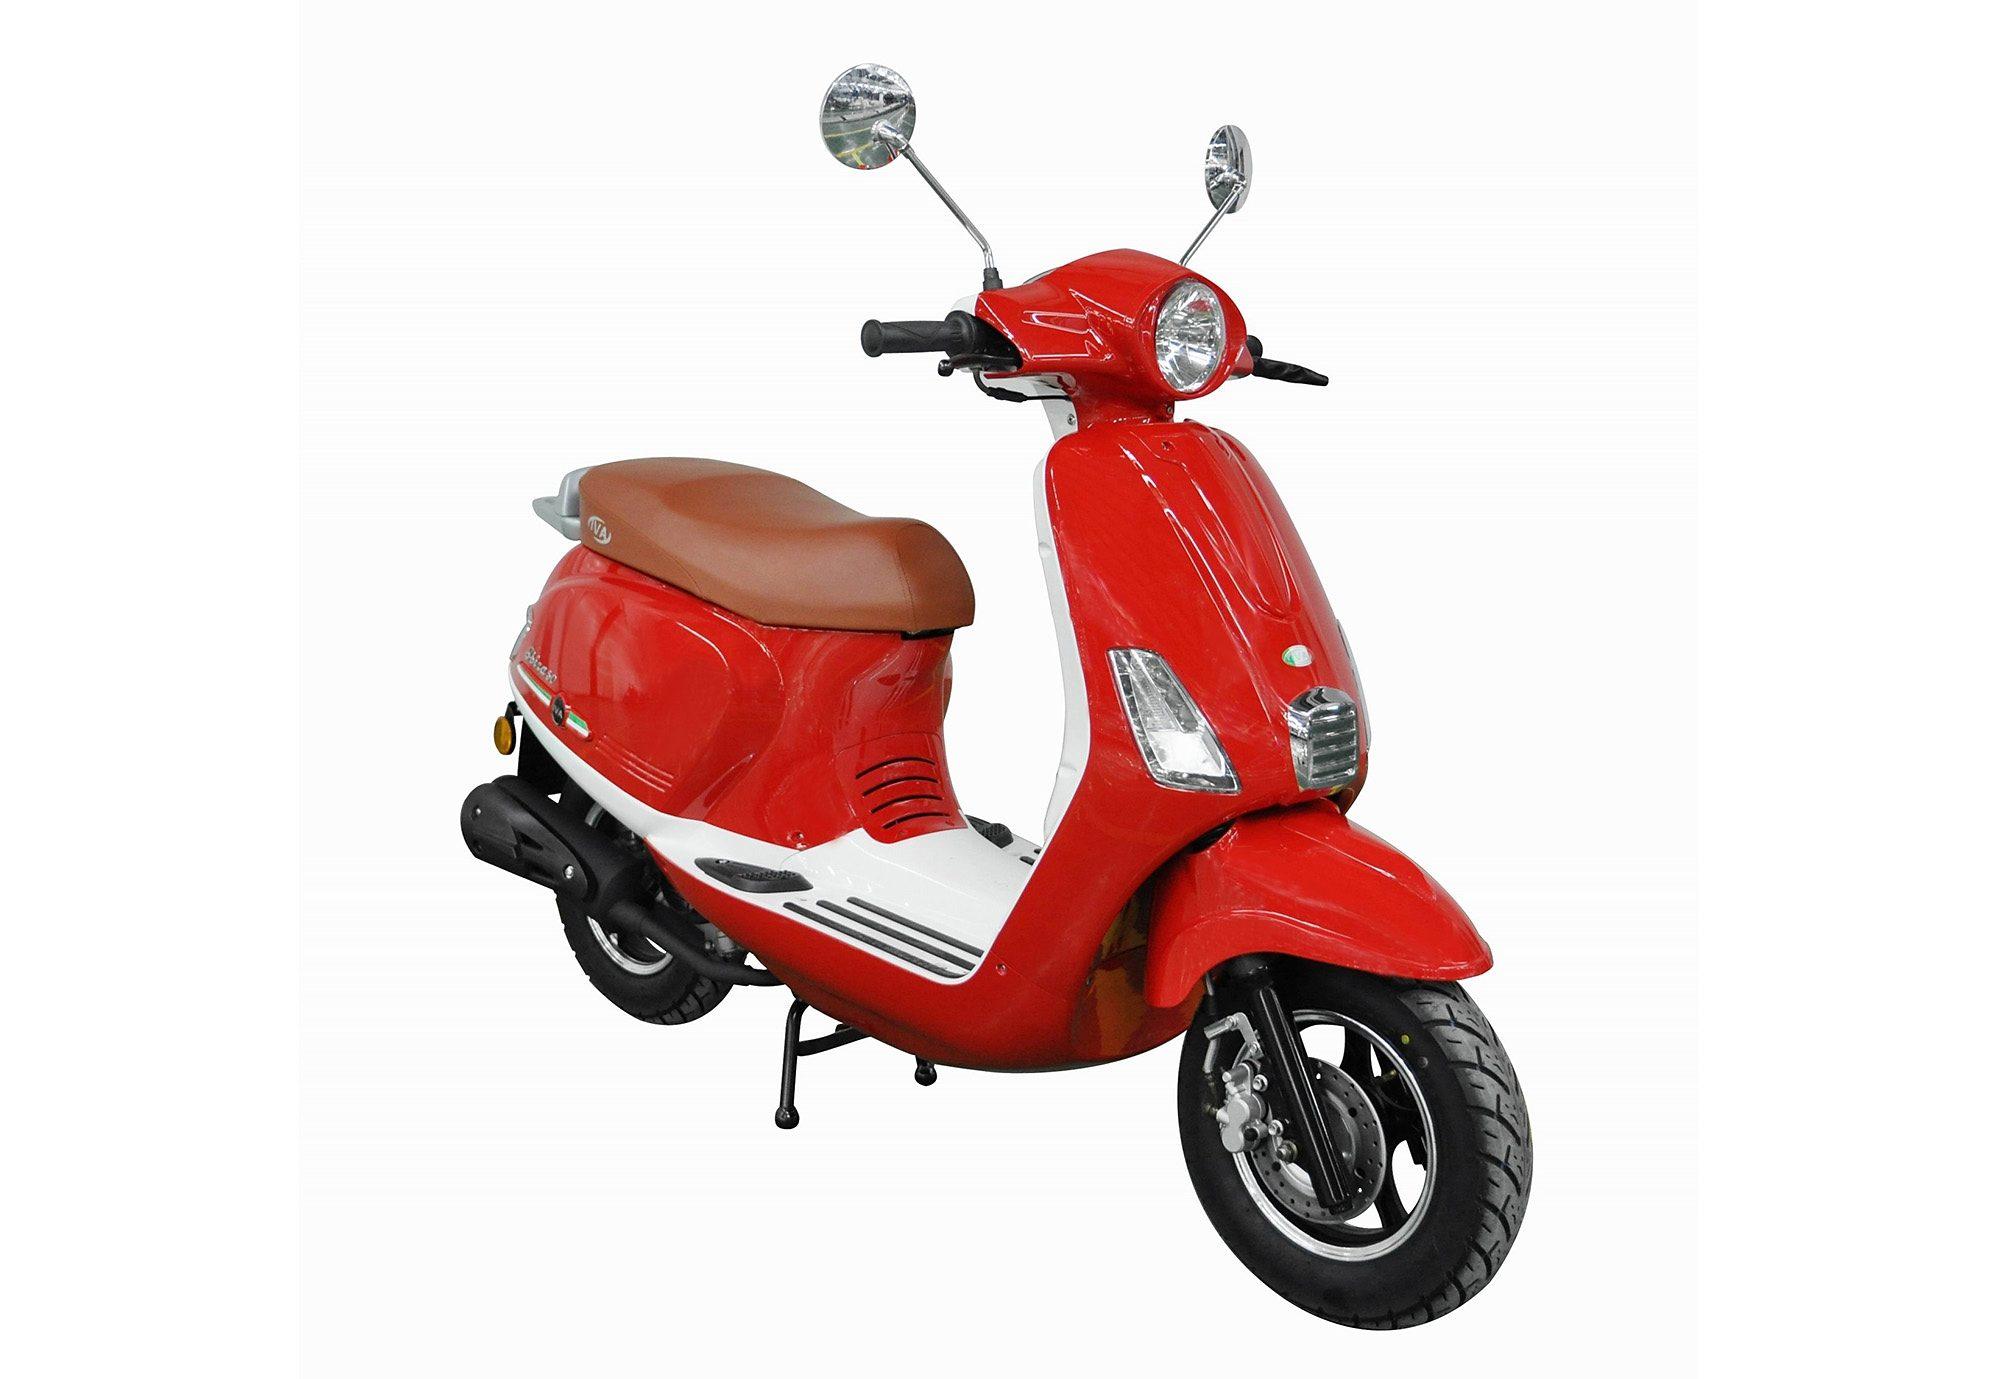 Motorroller, 50 ccm, 3 PS, 45 km/h, für 2 Personen, rot, »Ibiza«, IVA